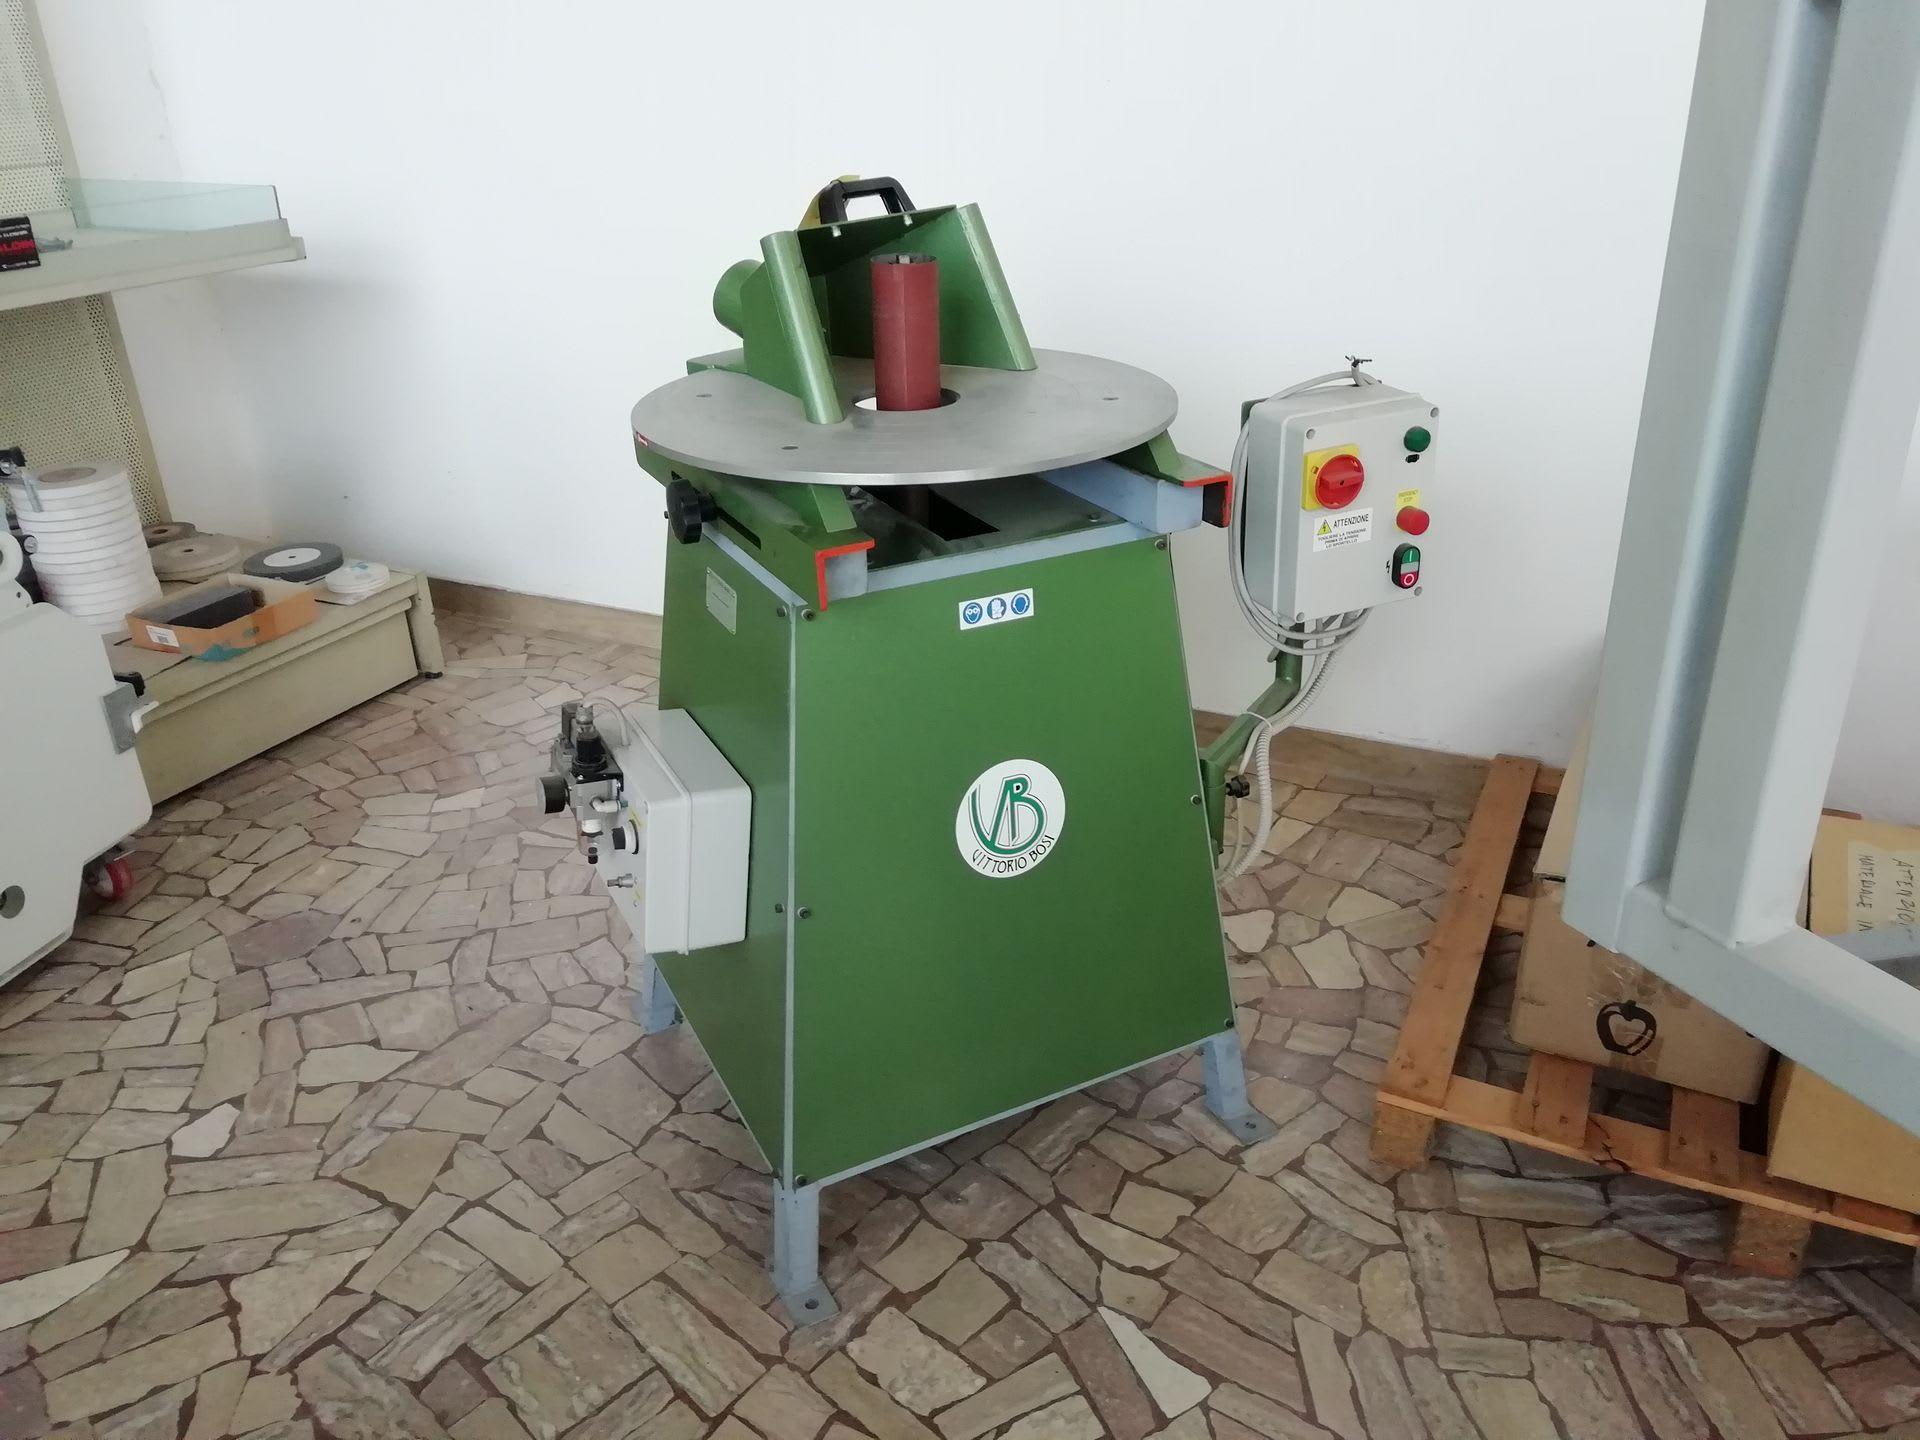 BOSI VITTORIO SD600 Schleifmaschine